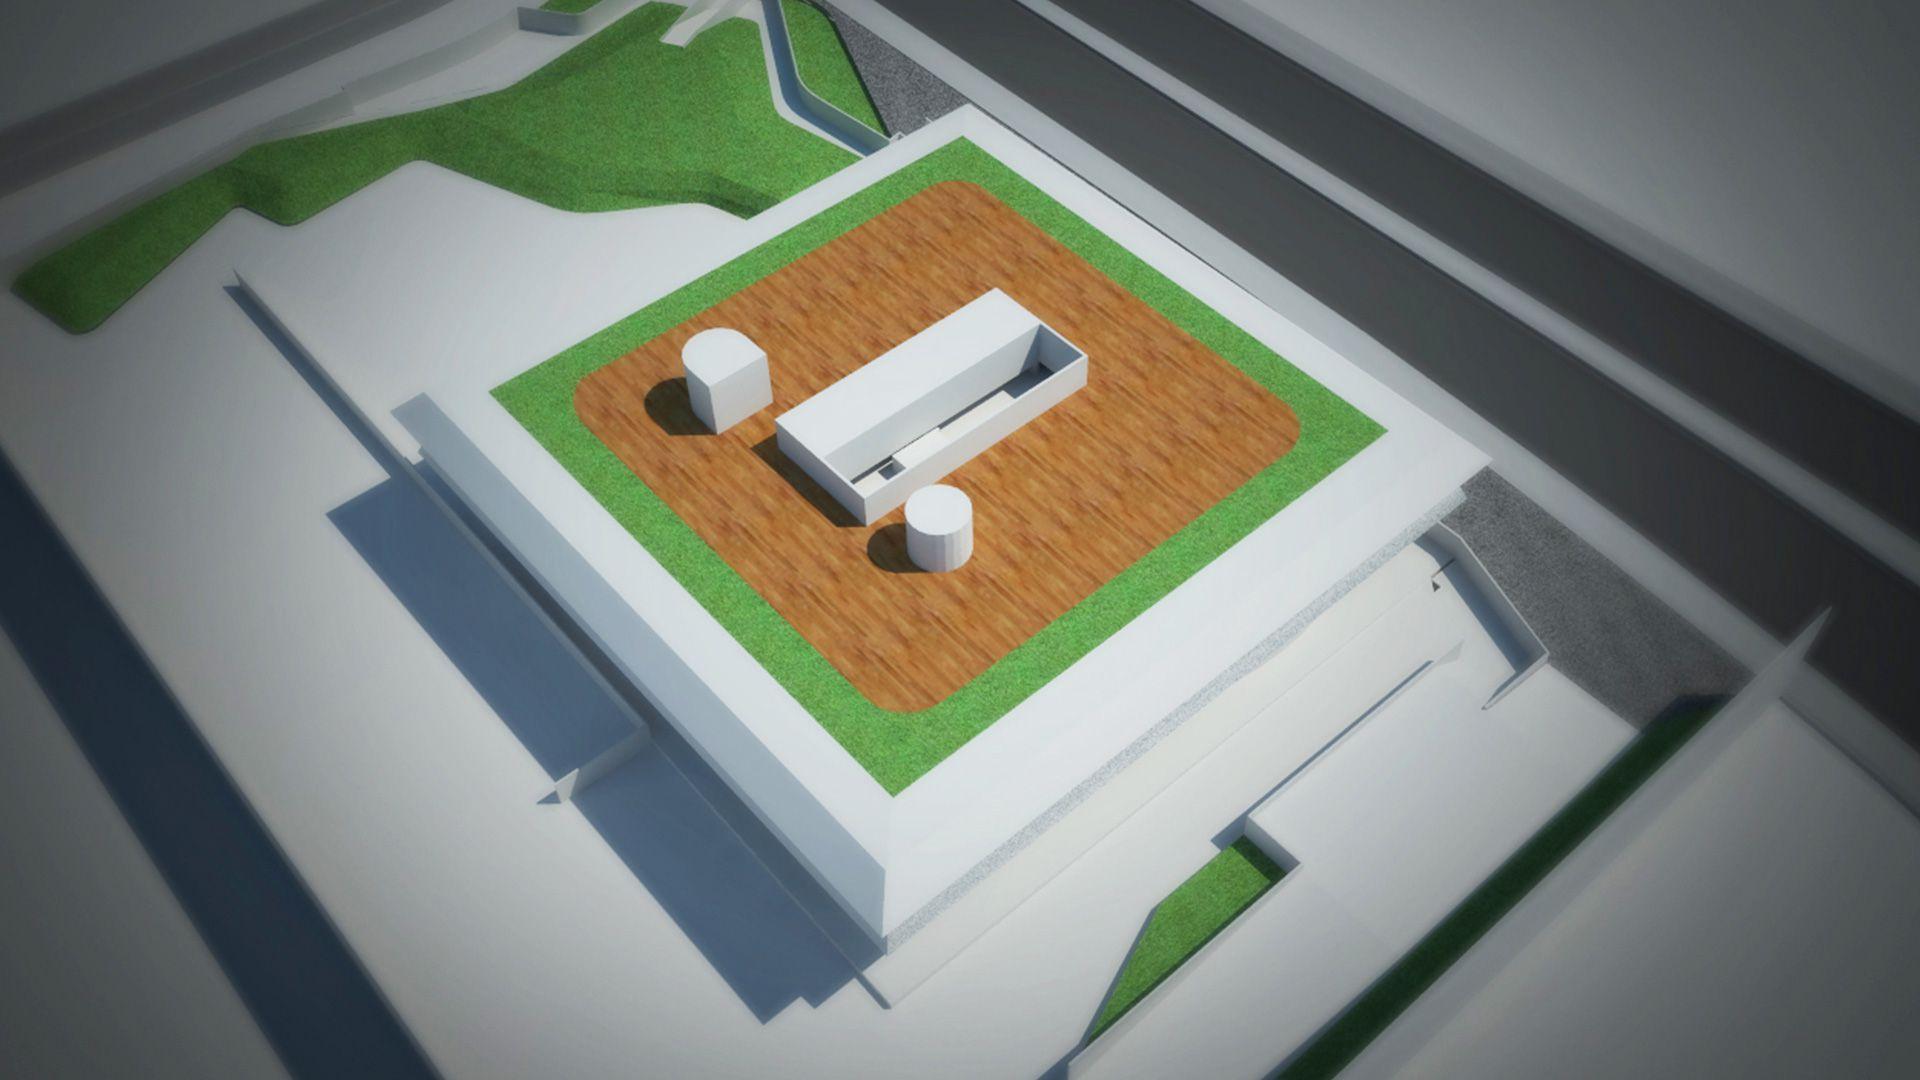 midiateca-santo-andre-render-layout-cobertura-proposta